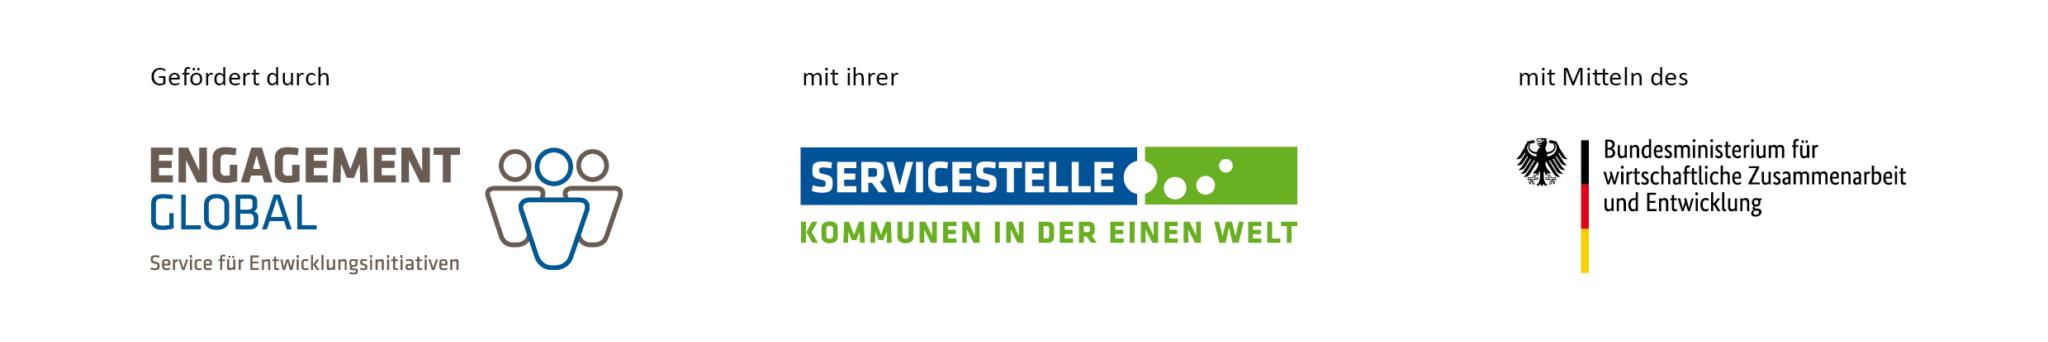 EG-SKEW-BMZ-Abbinder-gefördert-durch-mrz2019.jpg#asset:11379